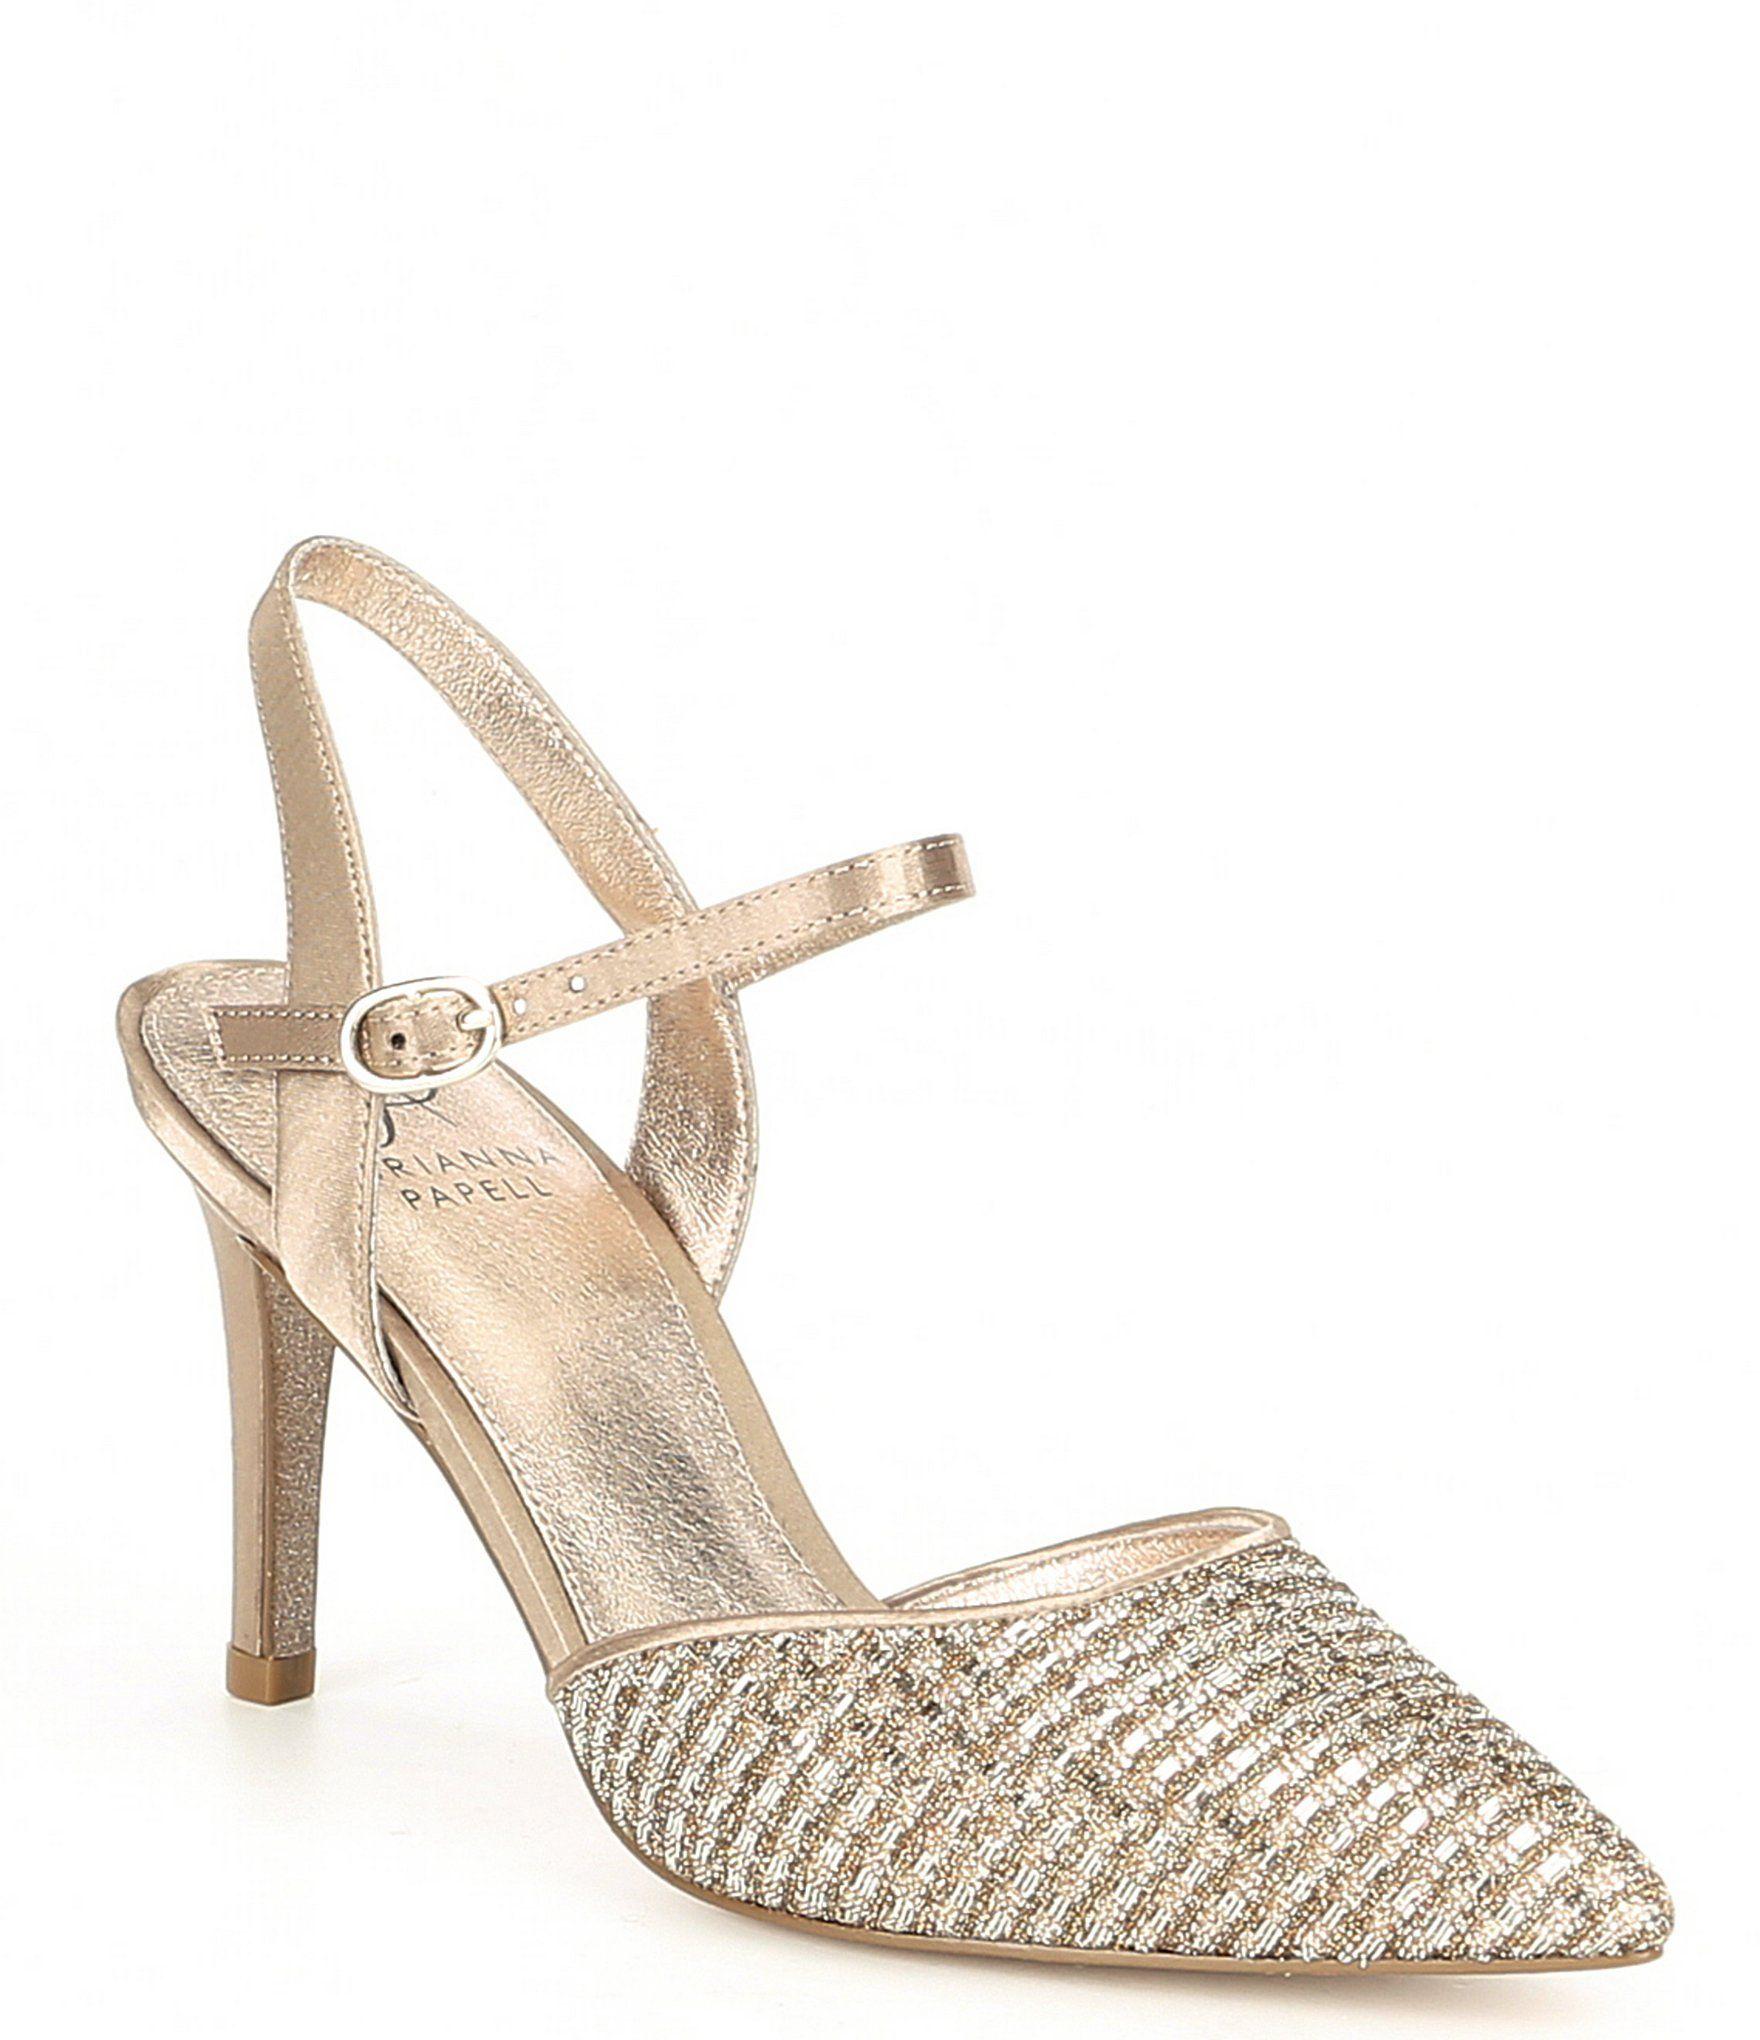 8871af932fe Adrianna Papell Hadleigh Metallic Glitter Fabric Dress Pumps ...